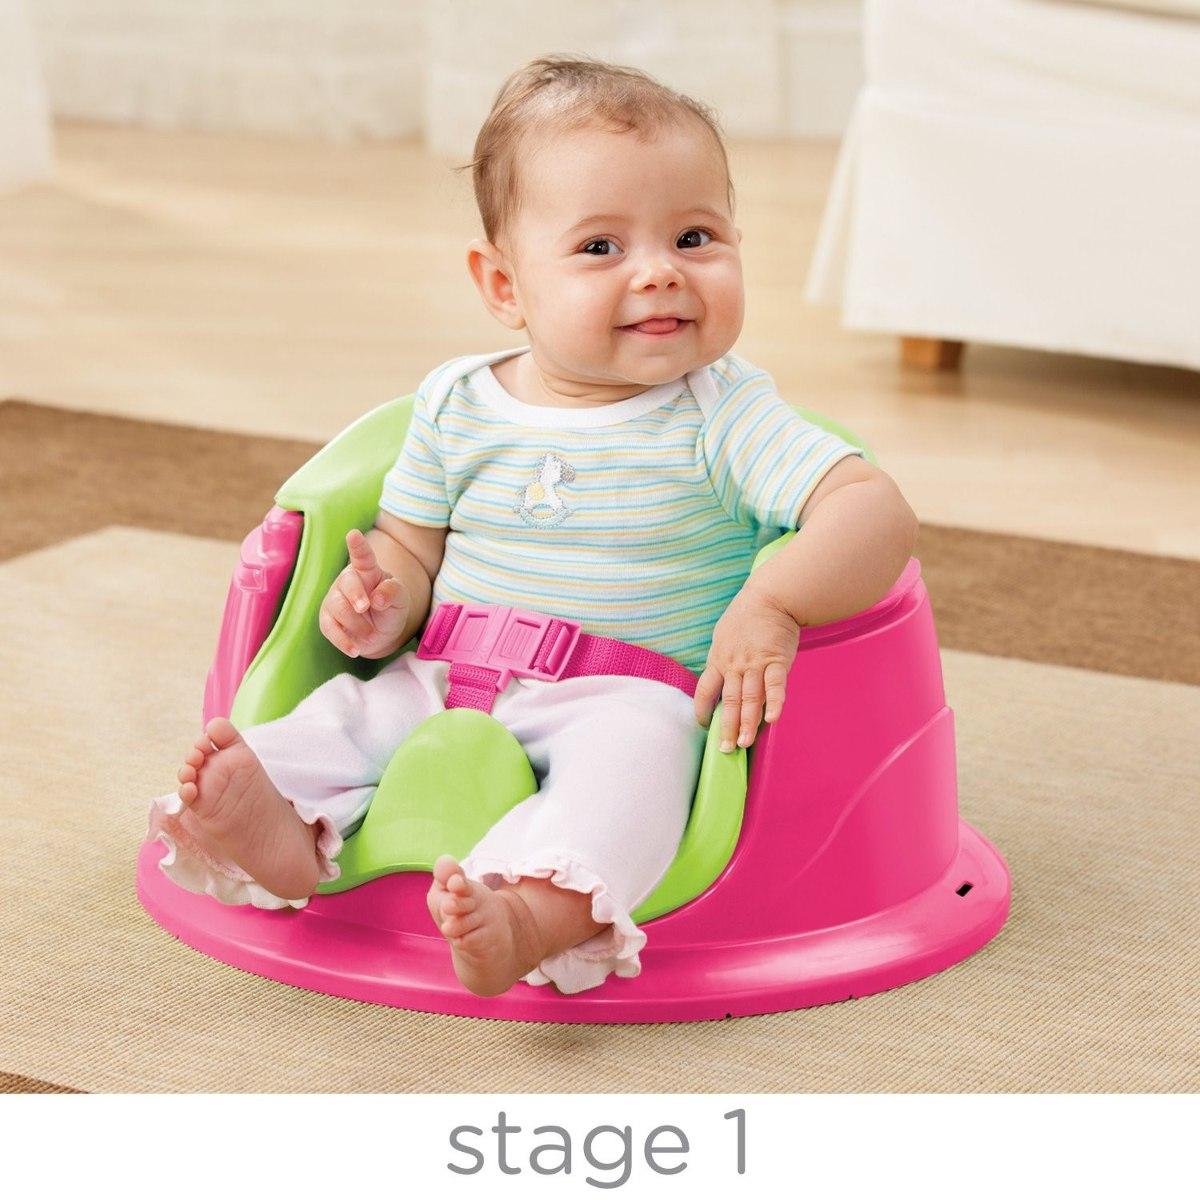 Silla Booster Gimnasio Summer Infant Para Bebe 3 Etapa